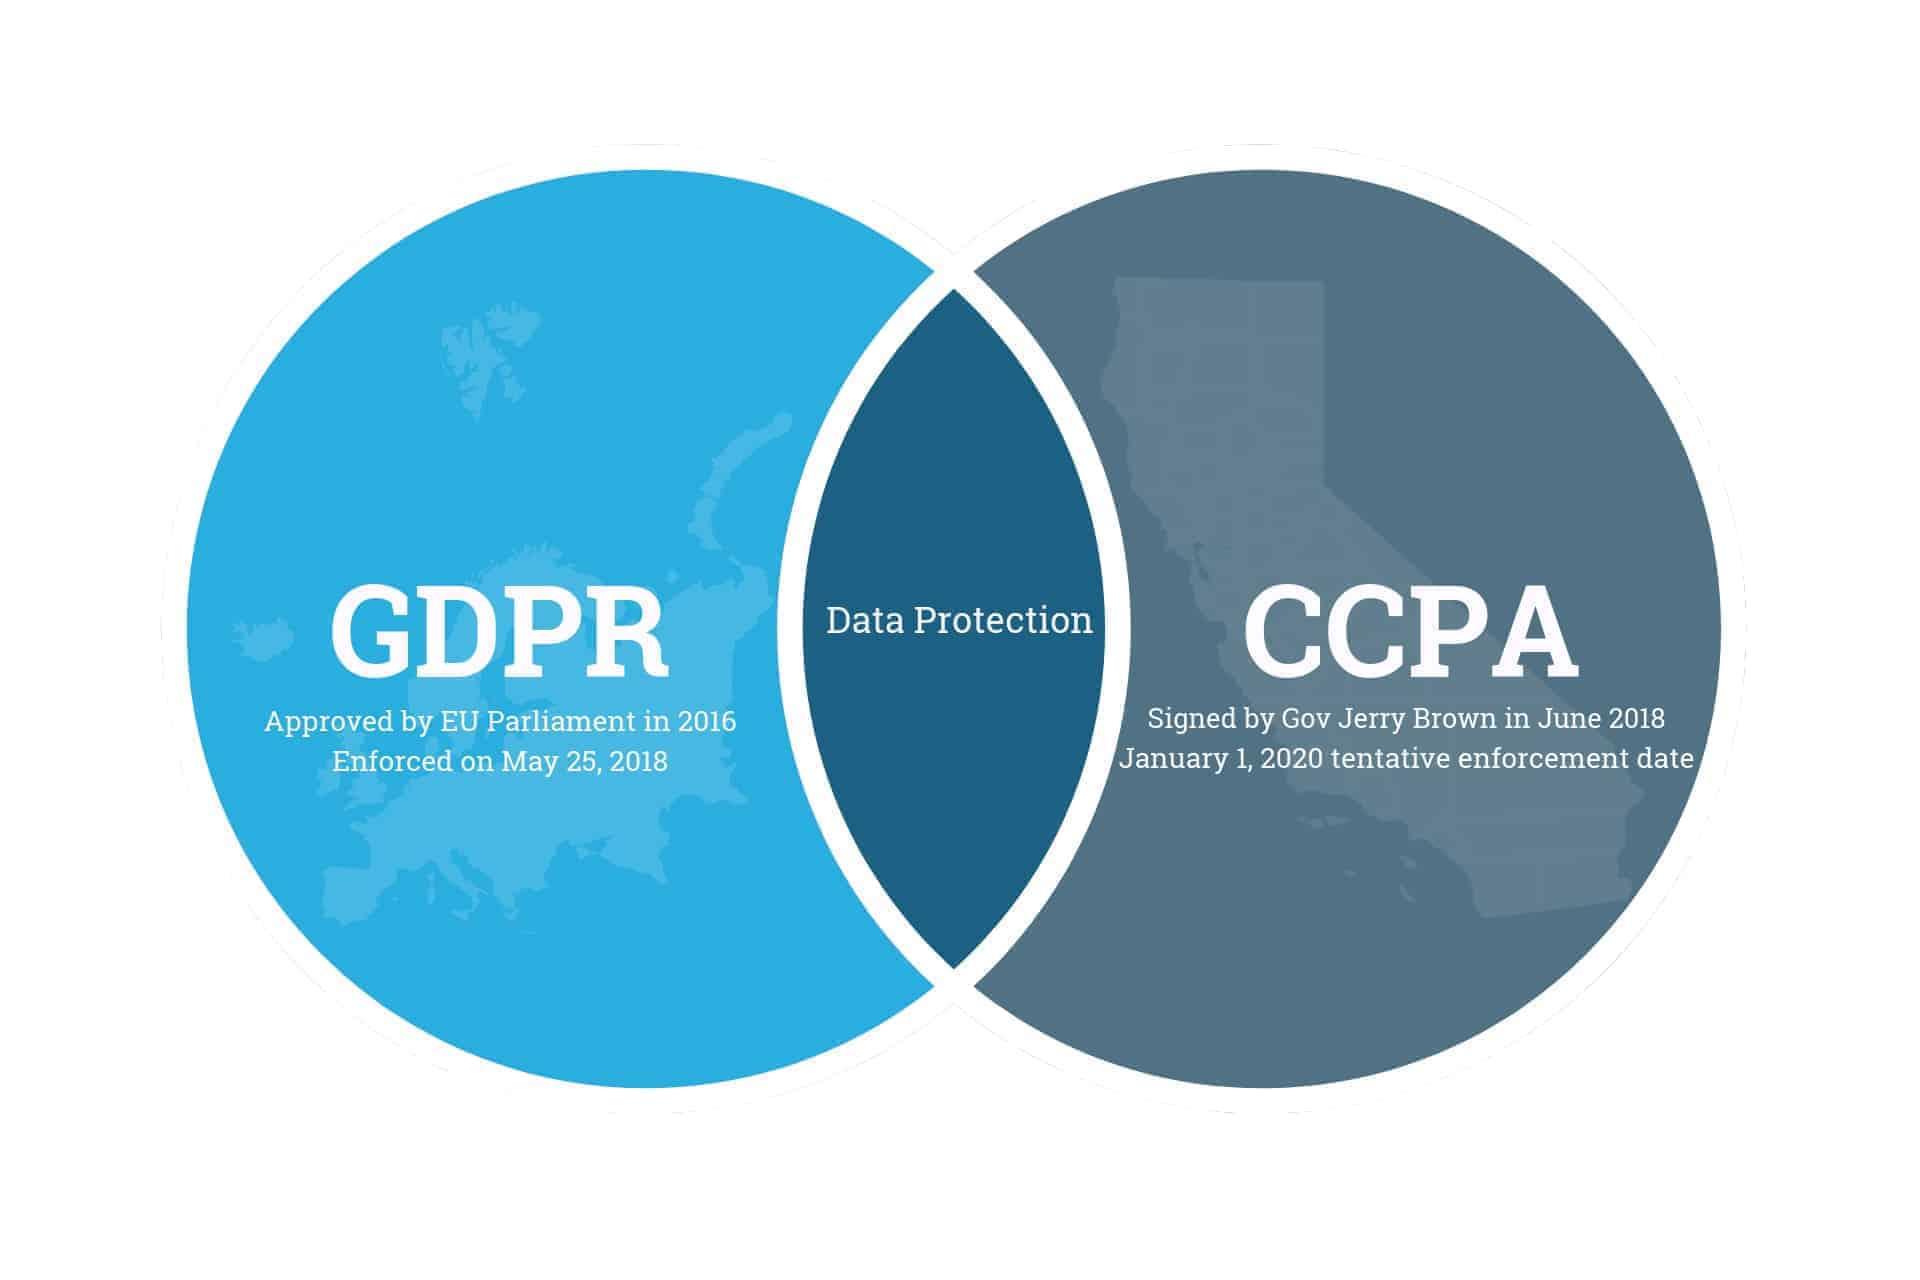 Database Security Risk